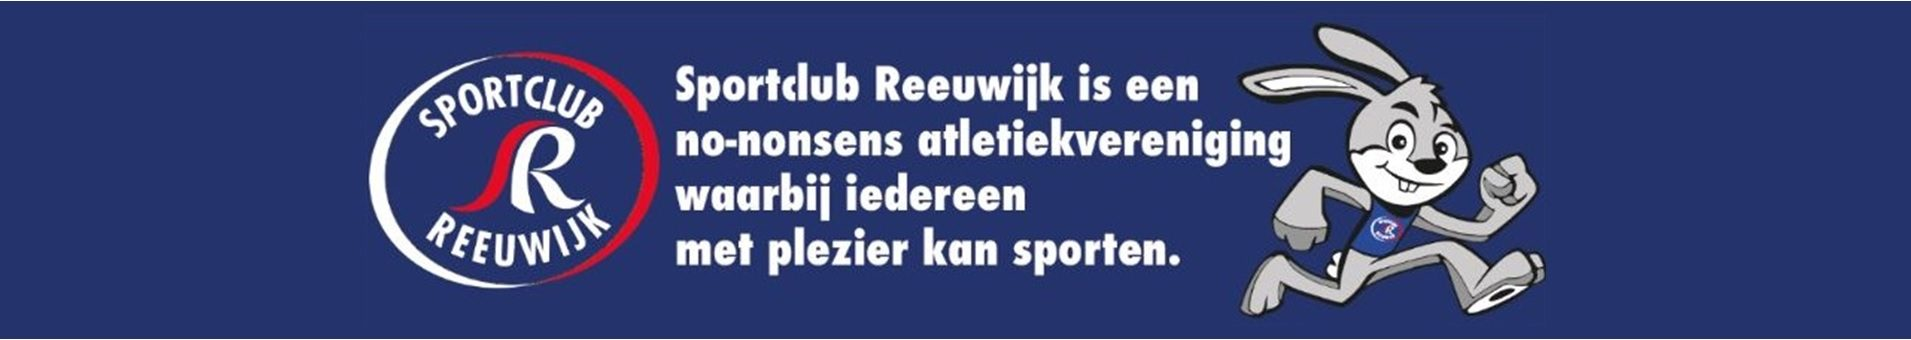 Sportclub Reeuwijk